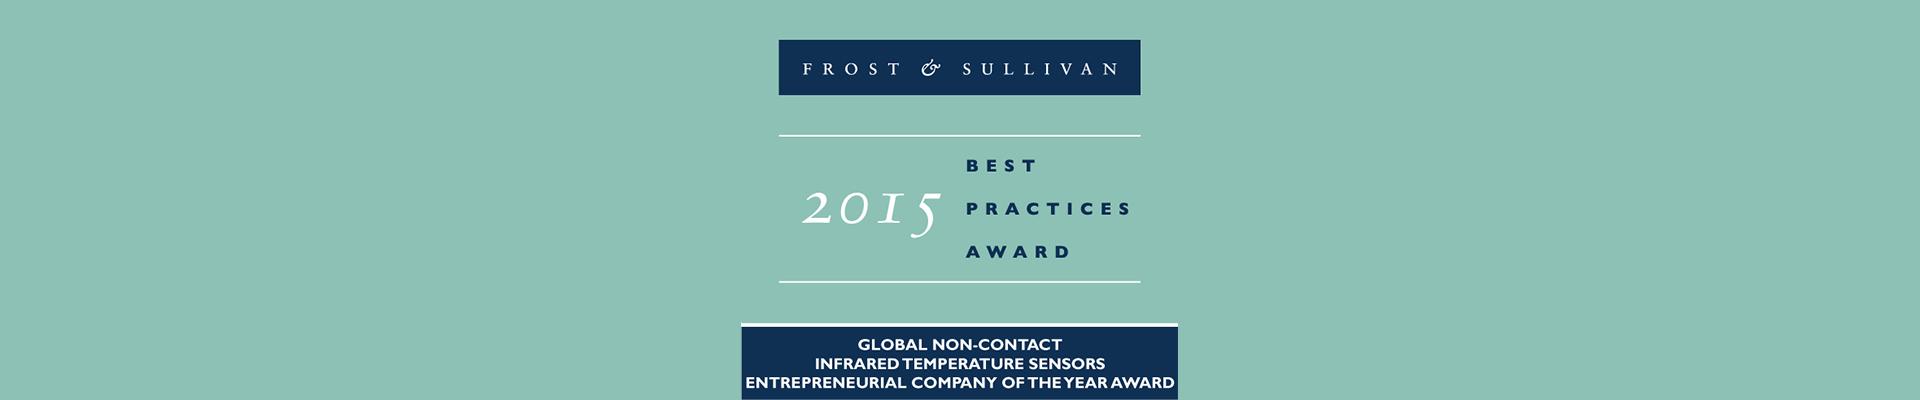 Bart van Liempd with Frost and Sullivan Award for Exergen Global